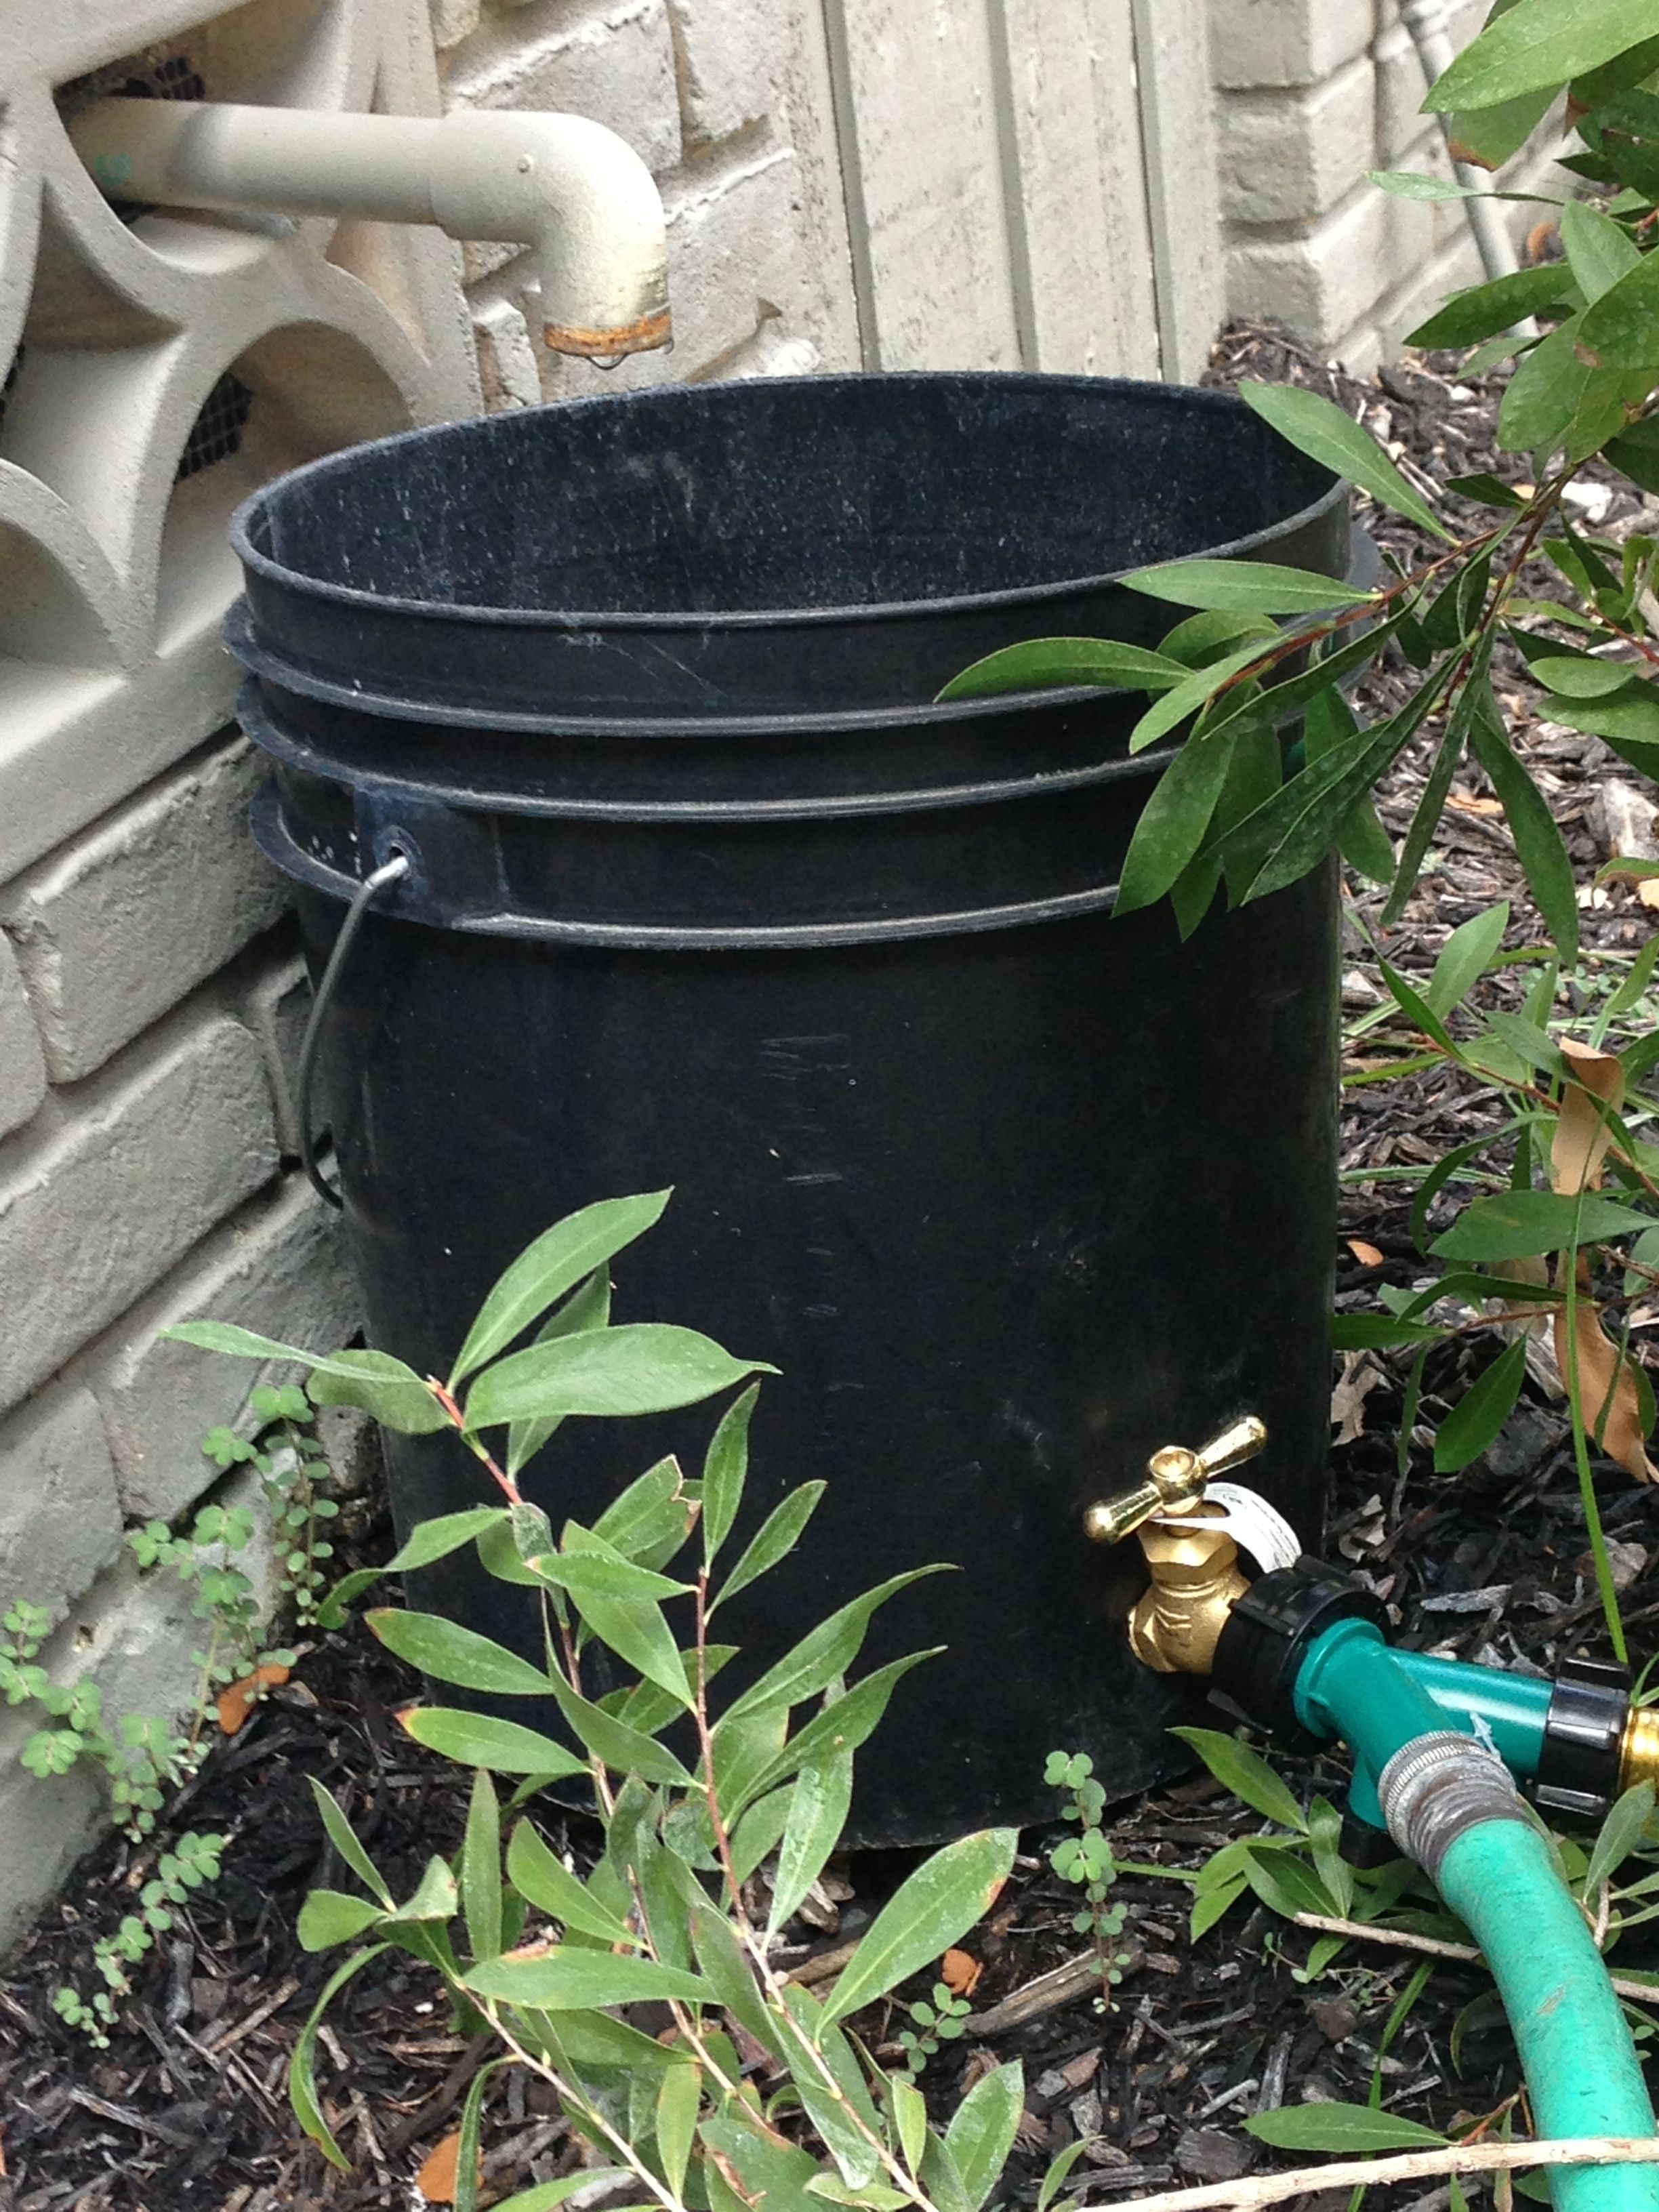 AC drip water collected & repurposed 5 gal water bucket